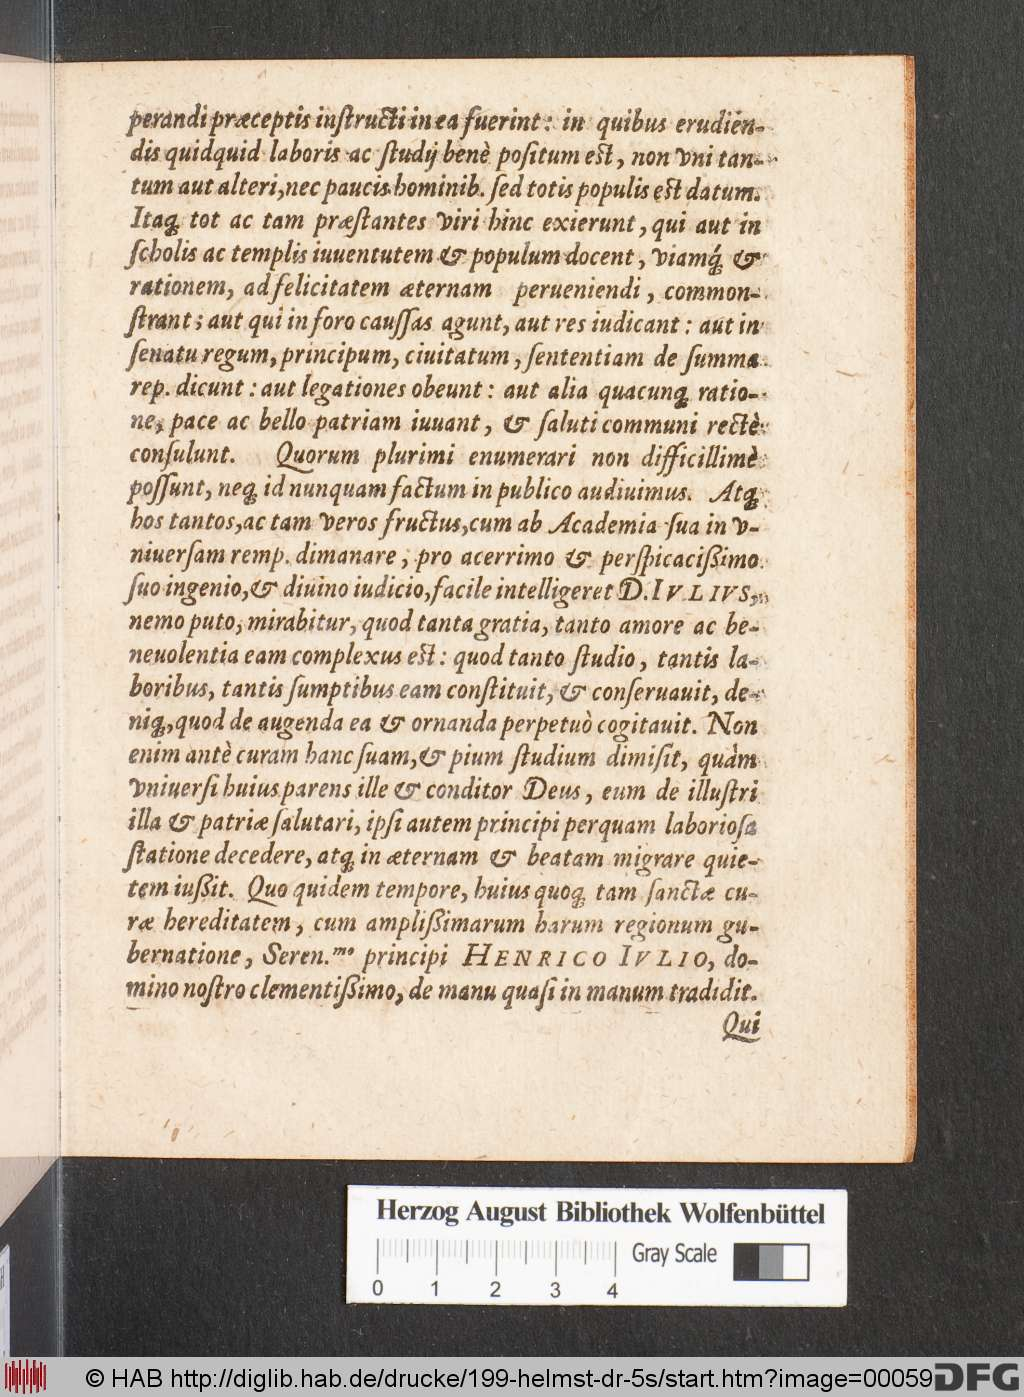 http://diglib.hab.de/drucke/199-helmst-dr-5s/00059.jpg